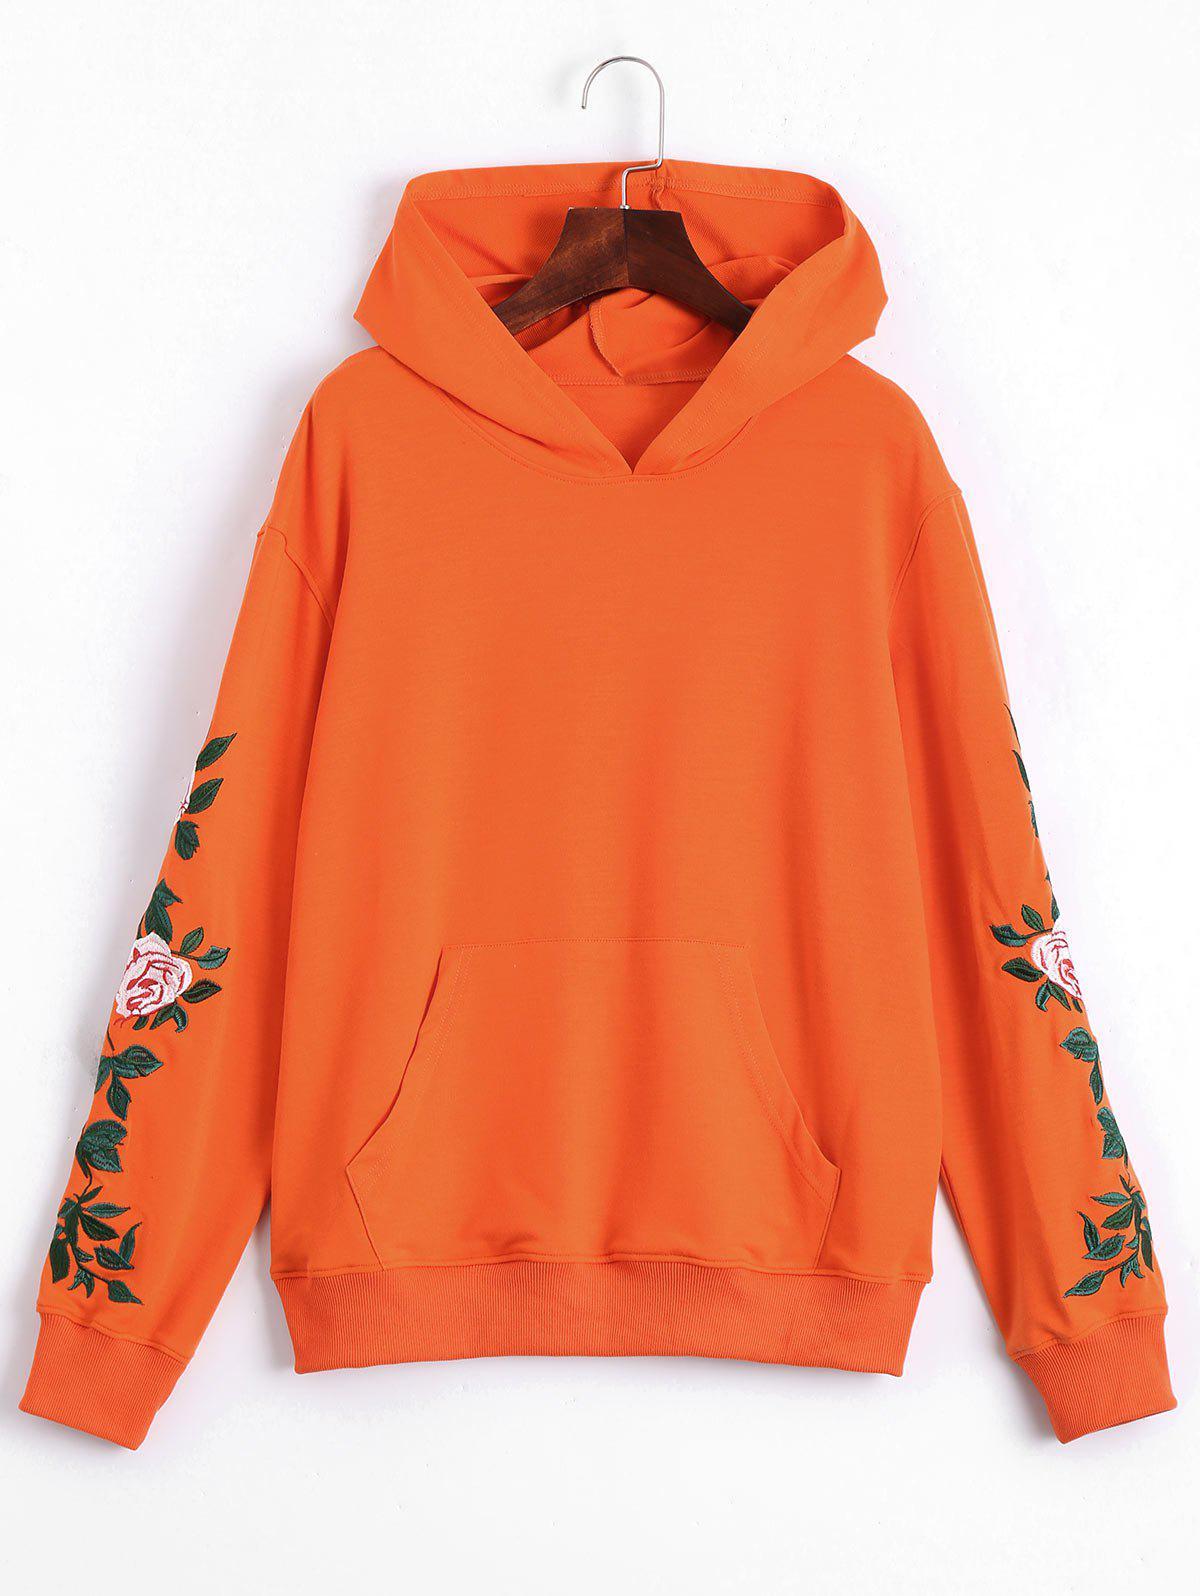 Floral Patched Front Pocket Hoodie - Orange M